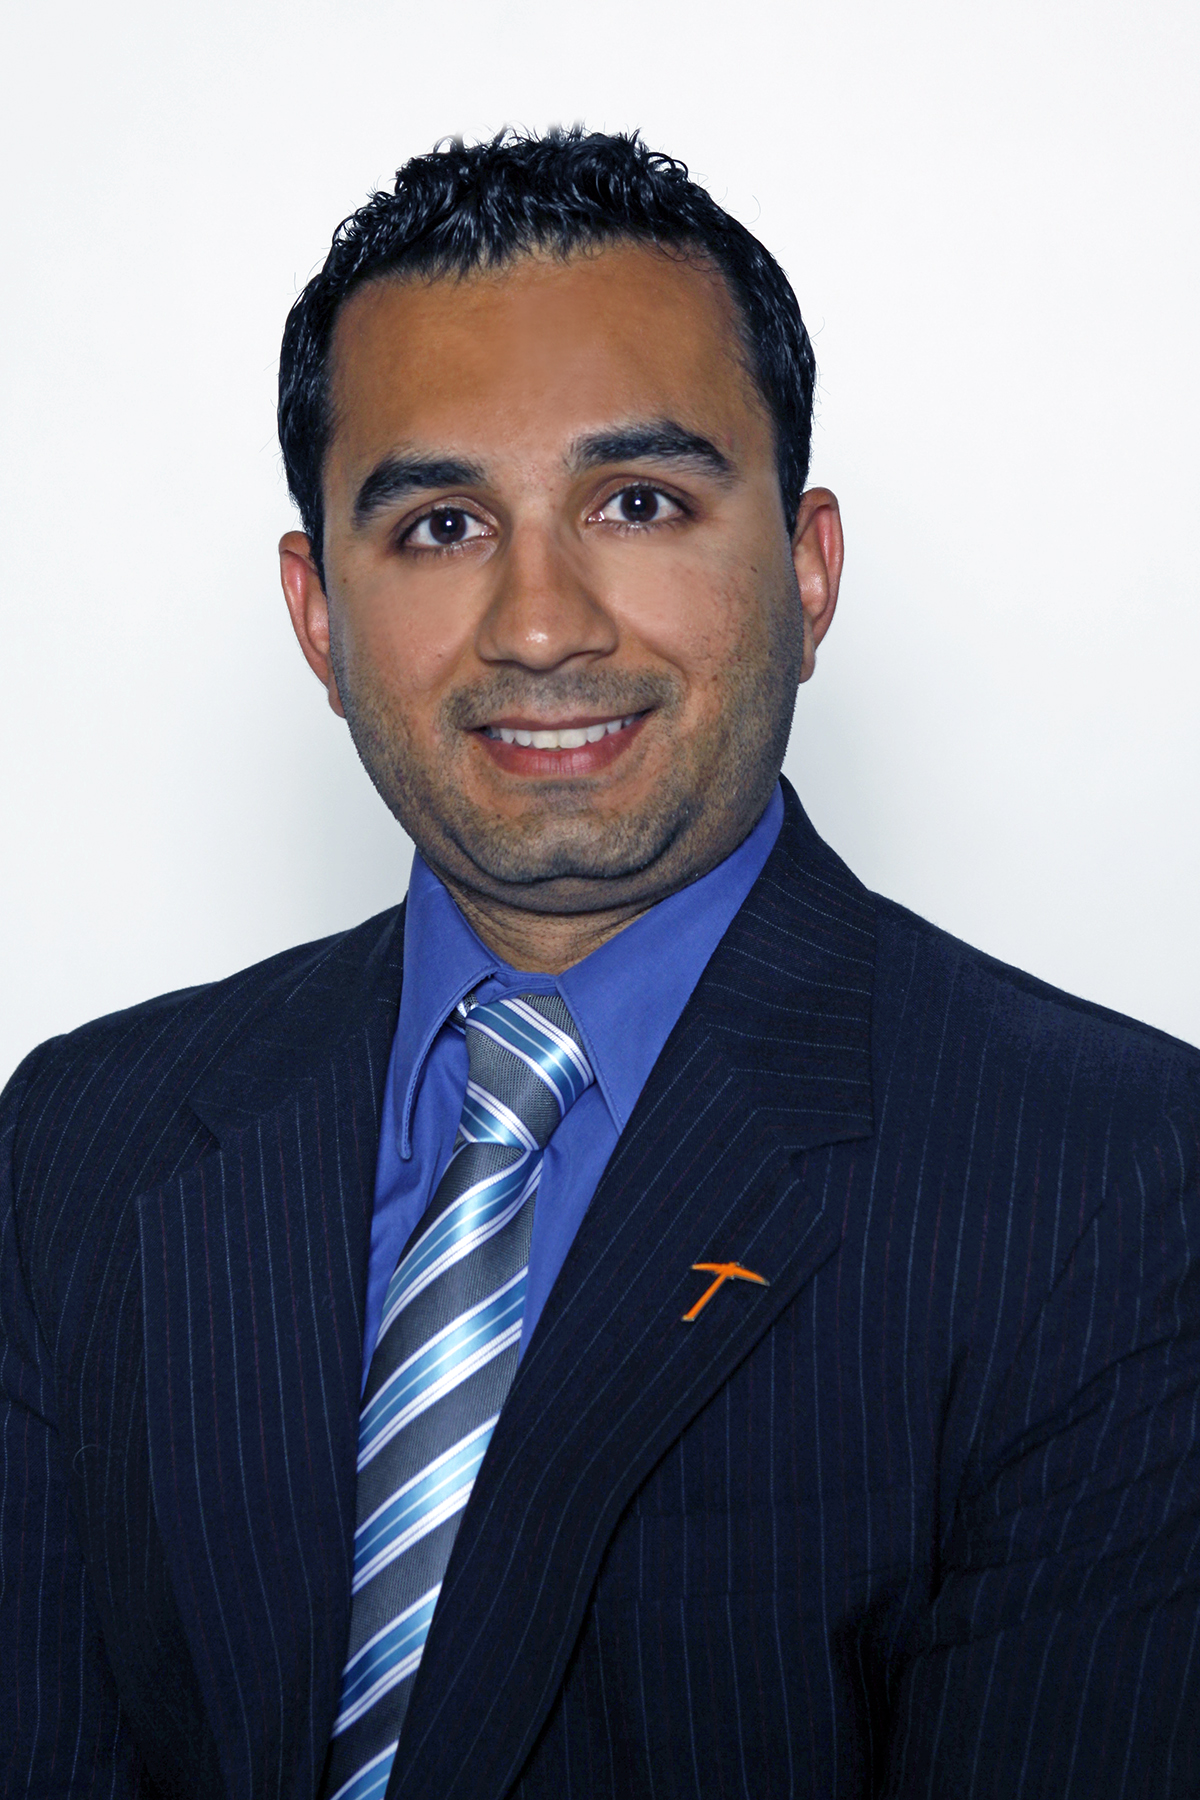 Saad Sheikh